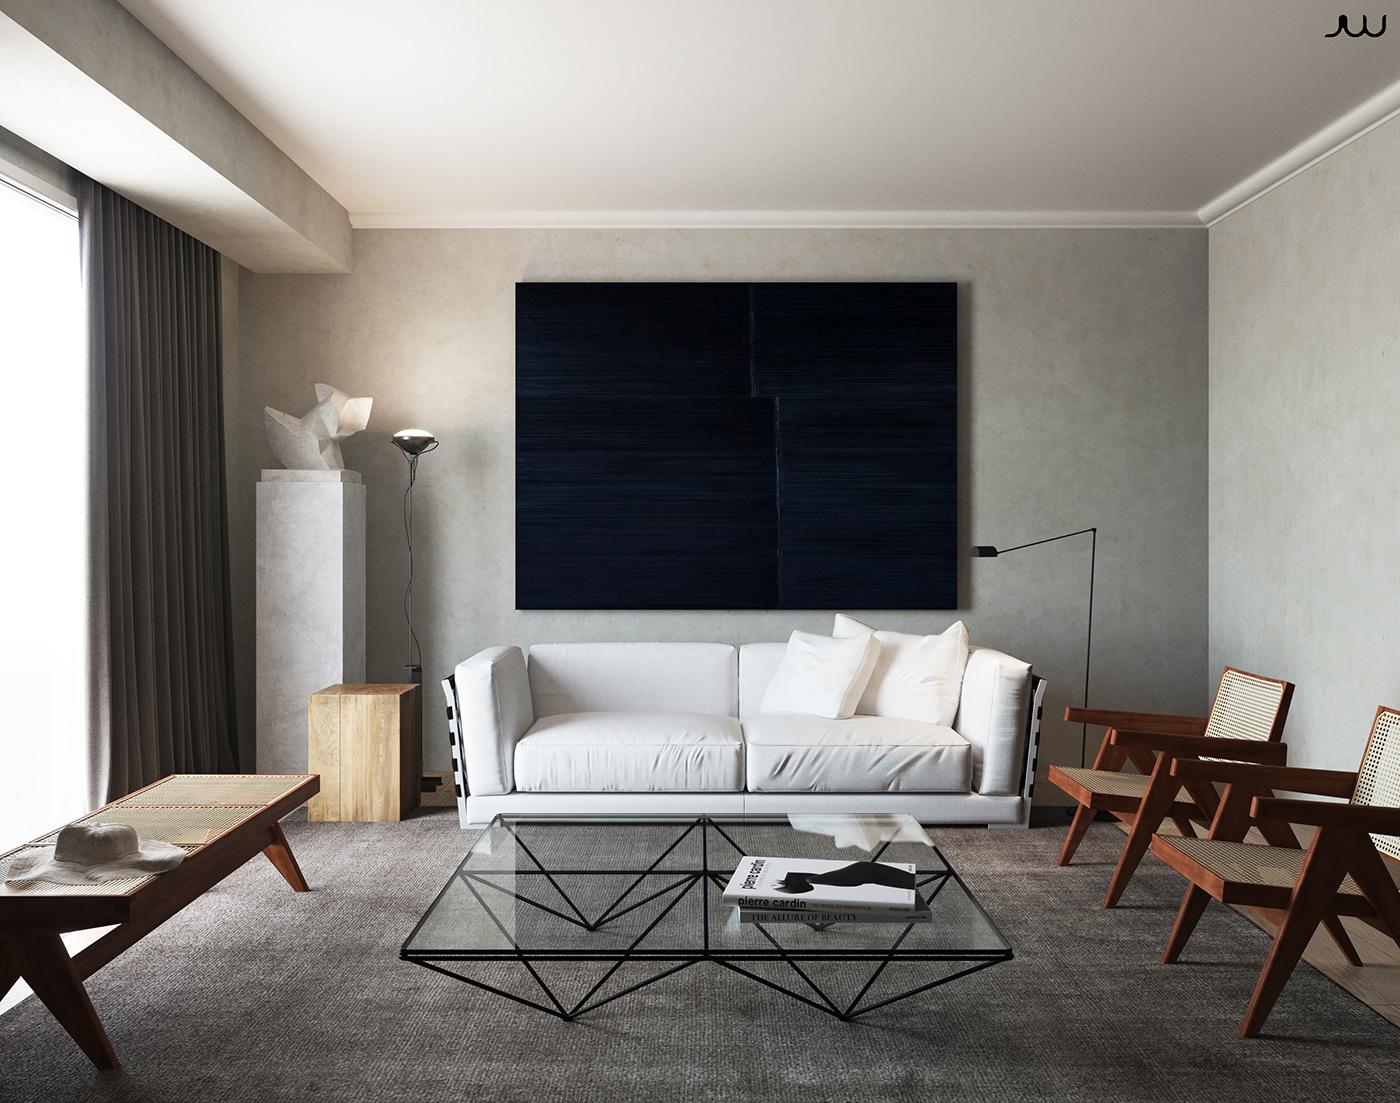 Render Interior design styling  interior style calm architectural CGI studio